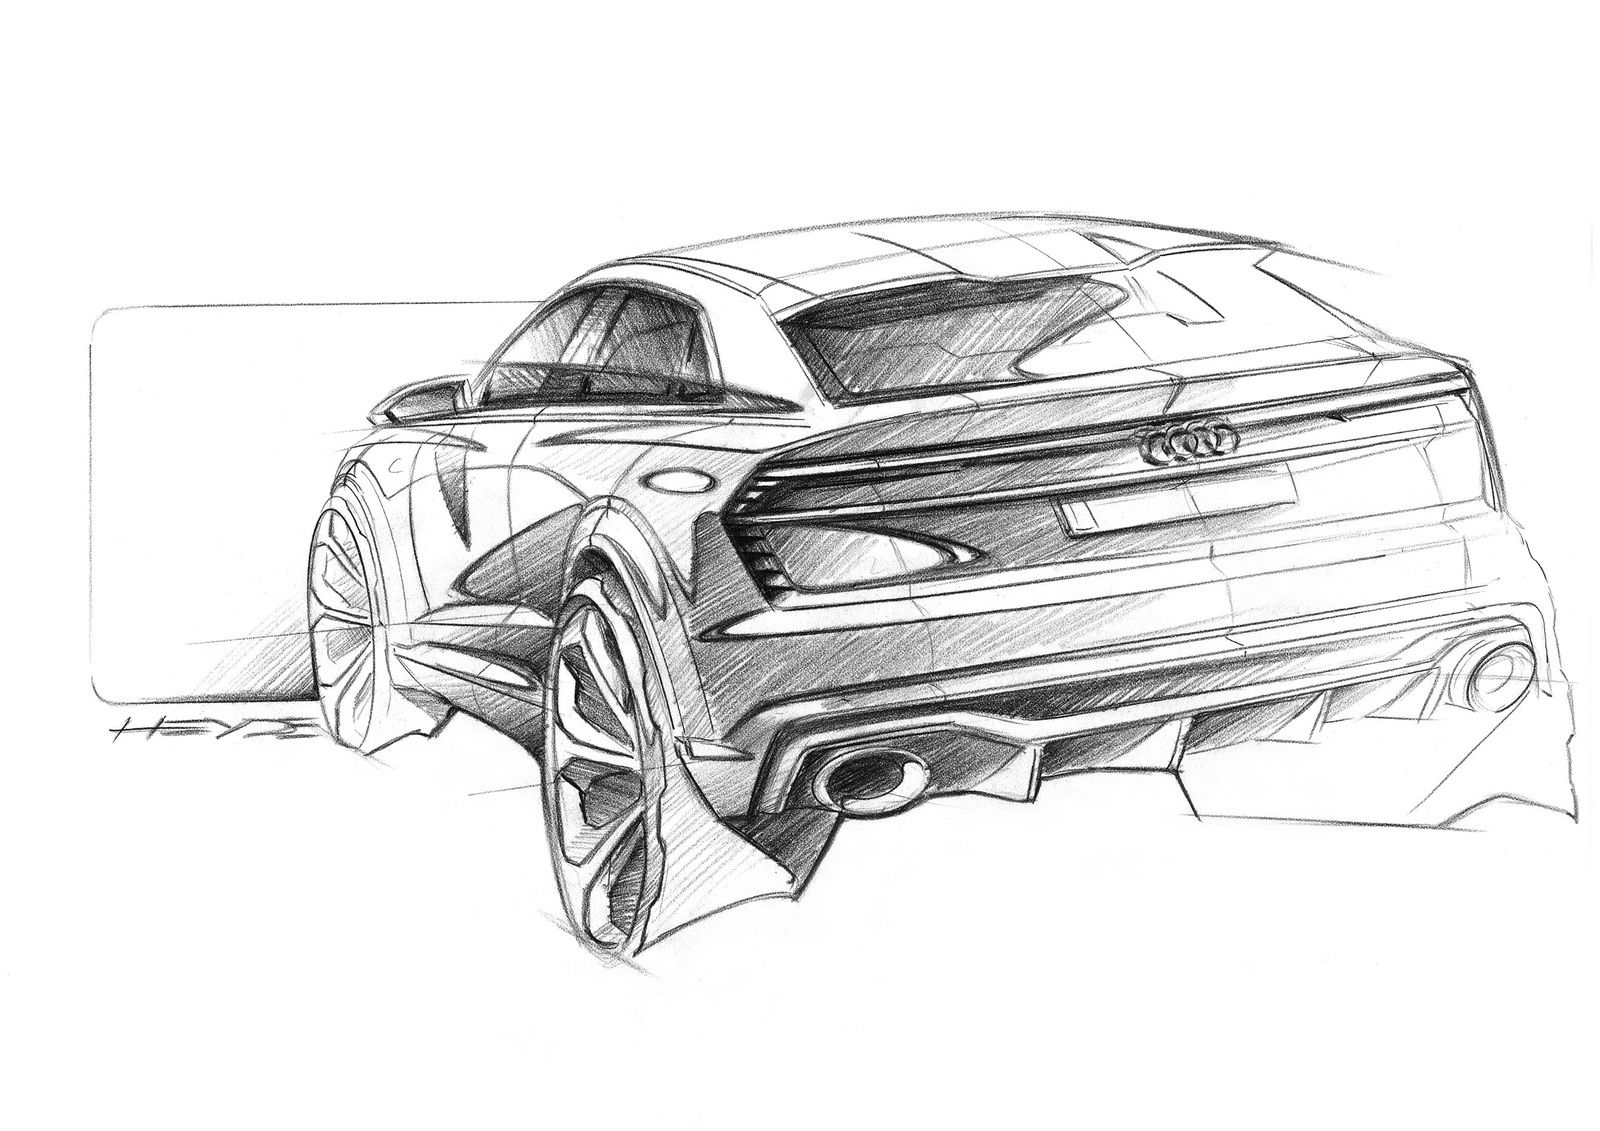 New Audi Q8 Sport Concept Is A 469hp Suv Heading Our Way Fast Carscoops Car Design Sketch Car Design Car Artwork